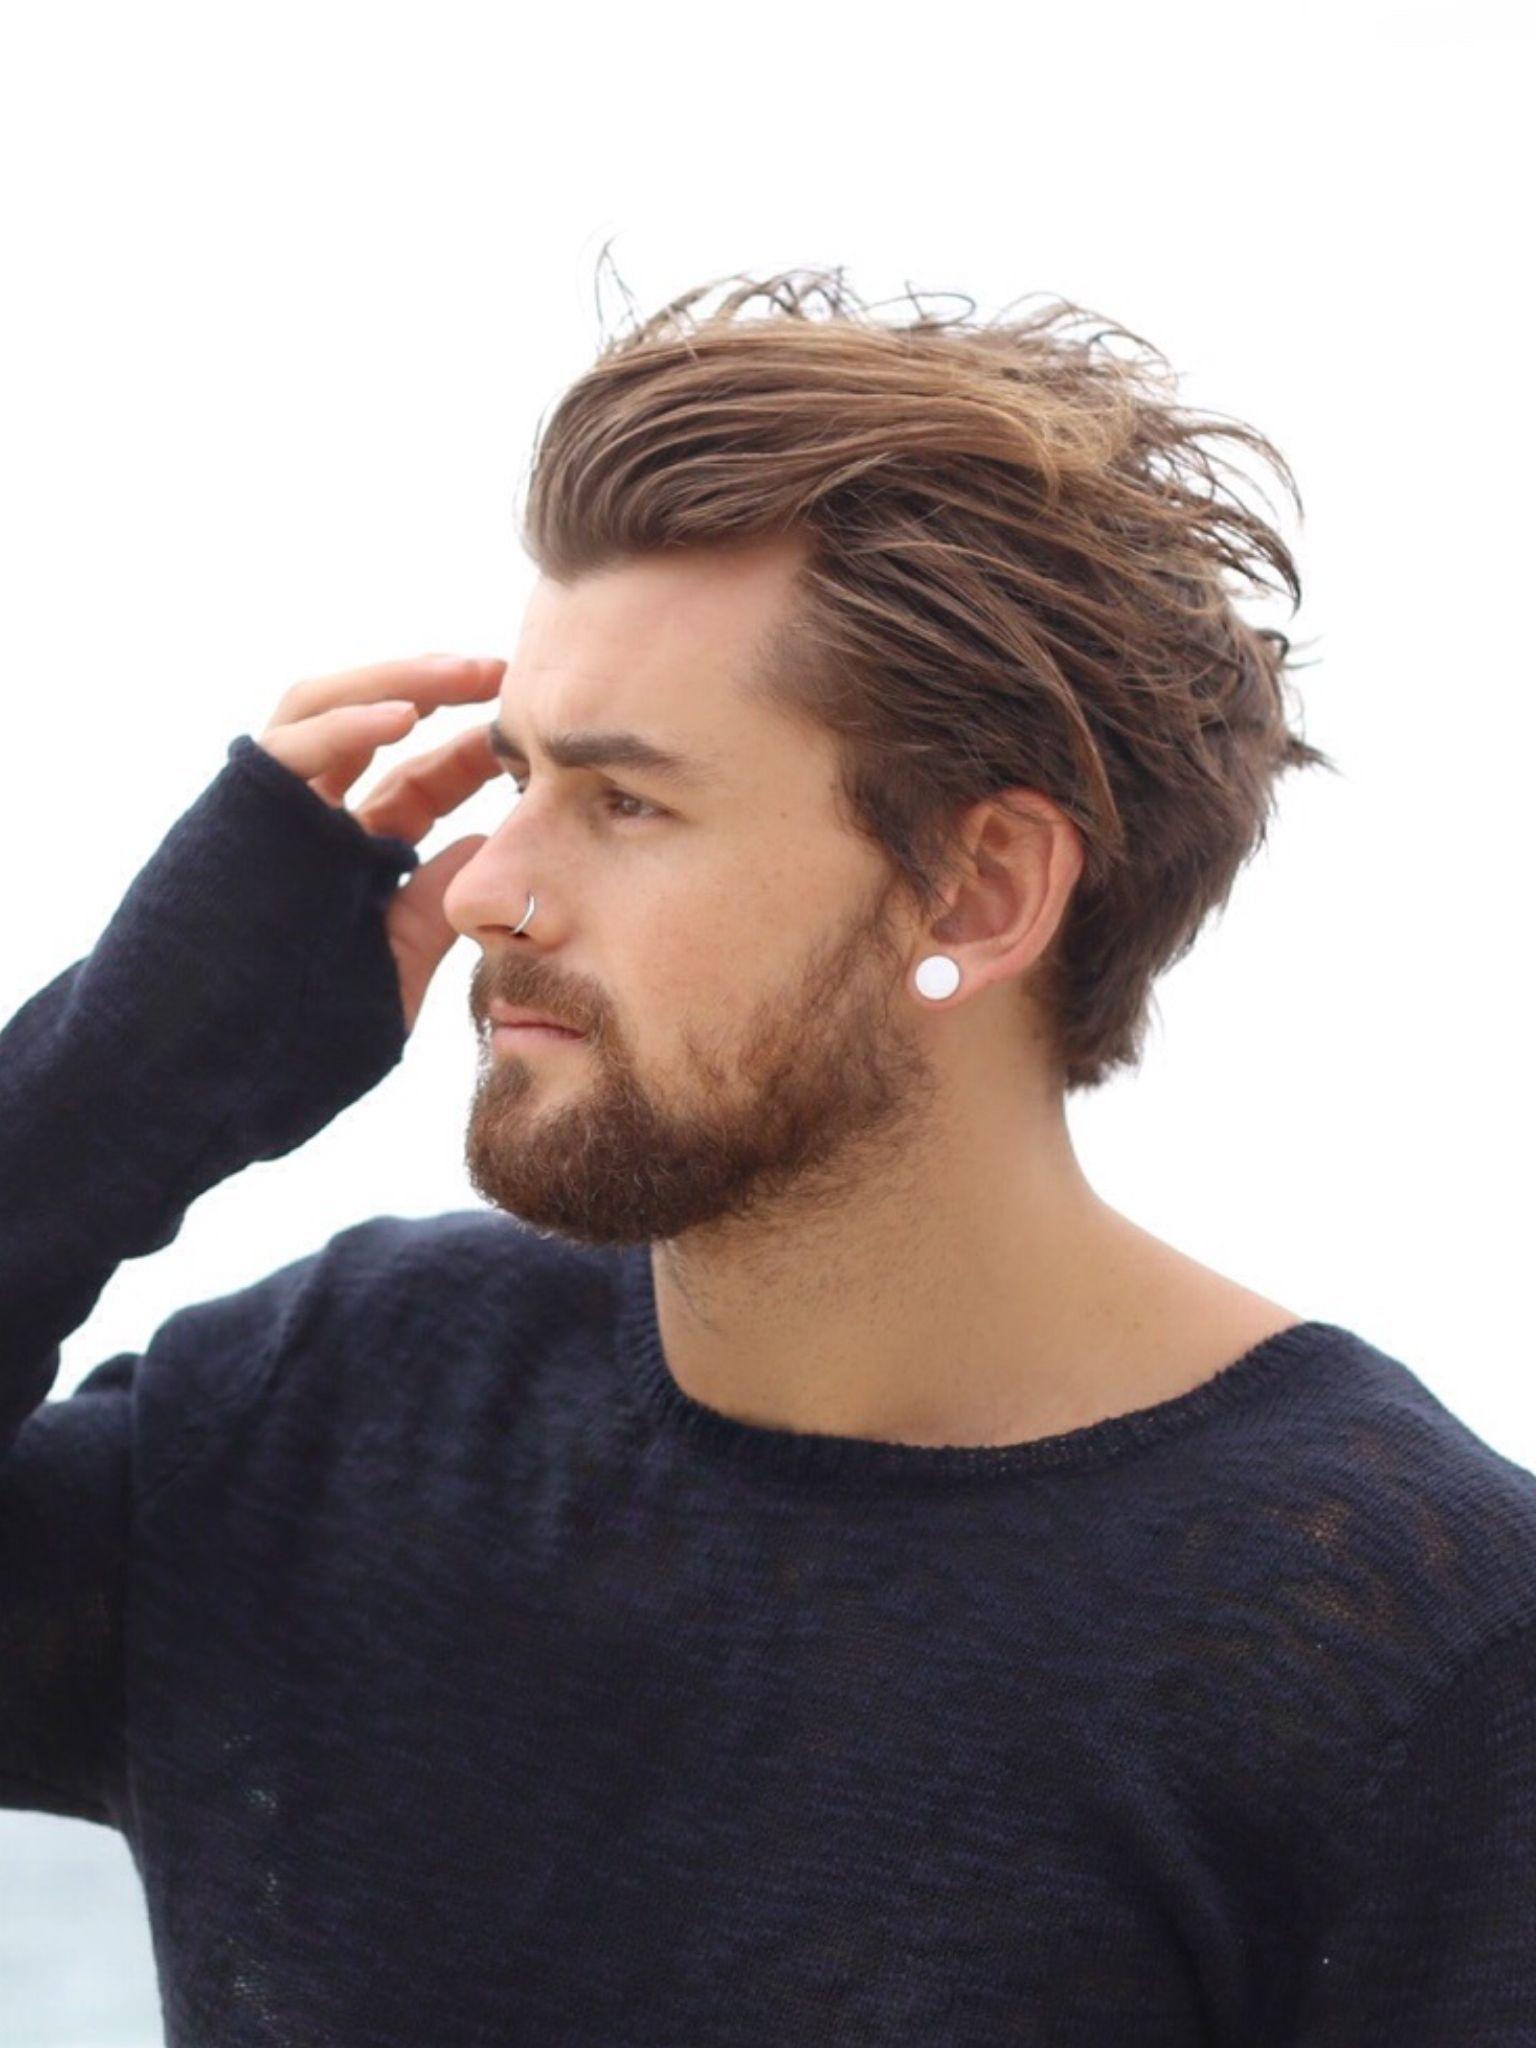 Pin by hardmec on piercing boys pinterest hair styles hair and